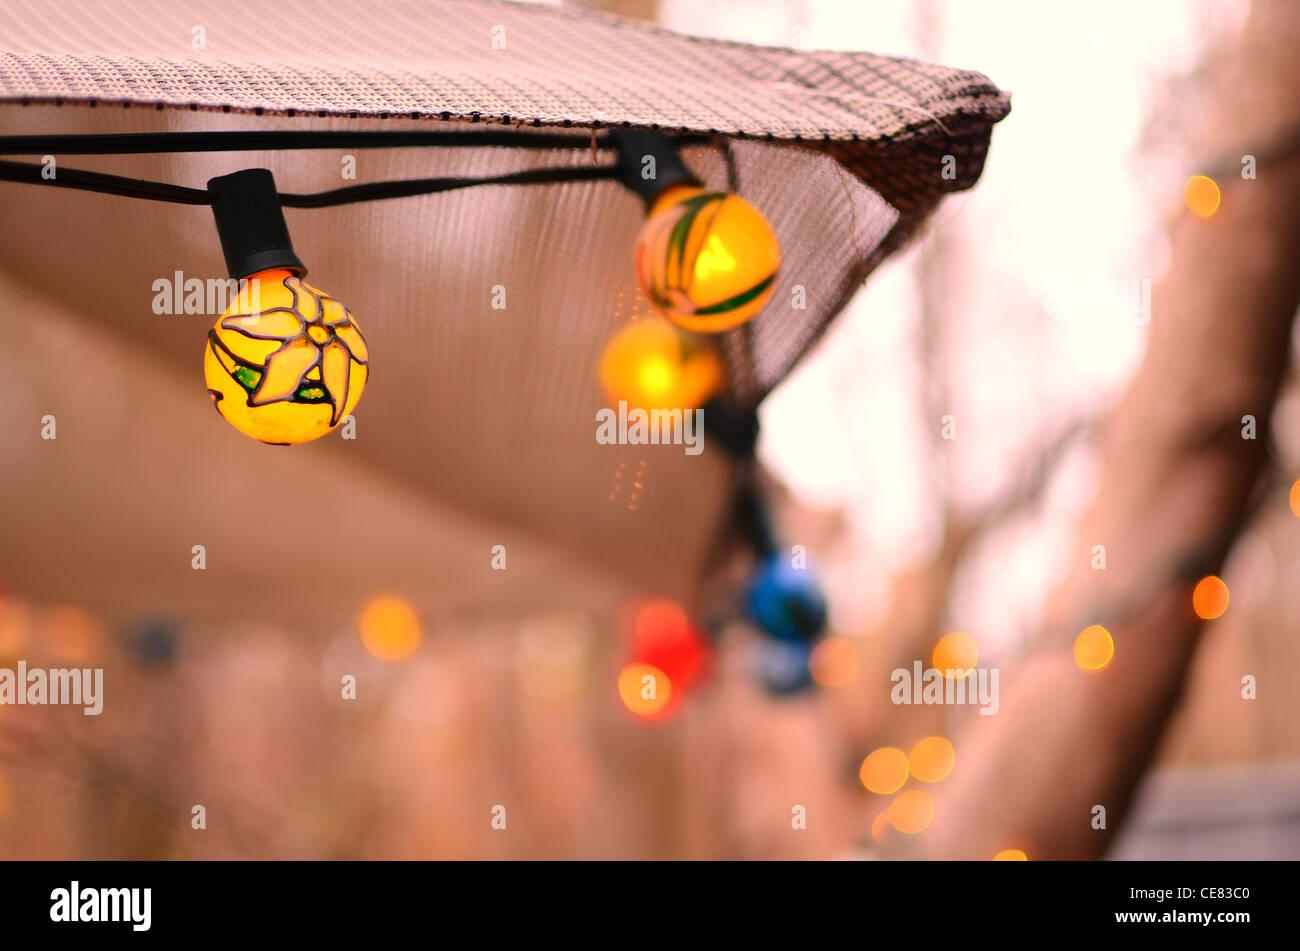 Luces de cadena en un patio paraguas Imagen De Stock